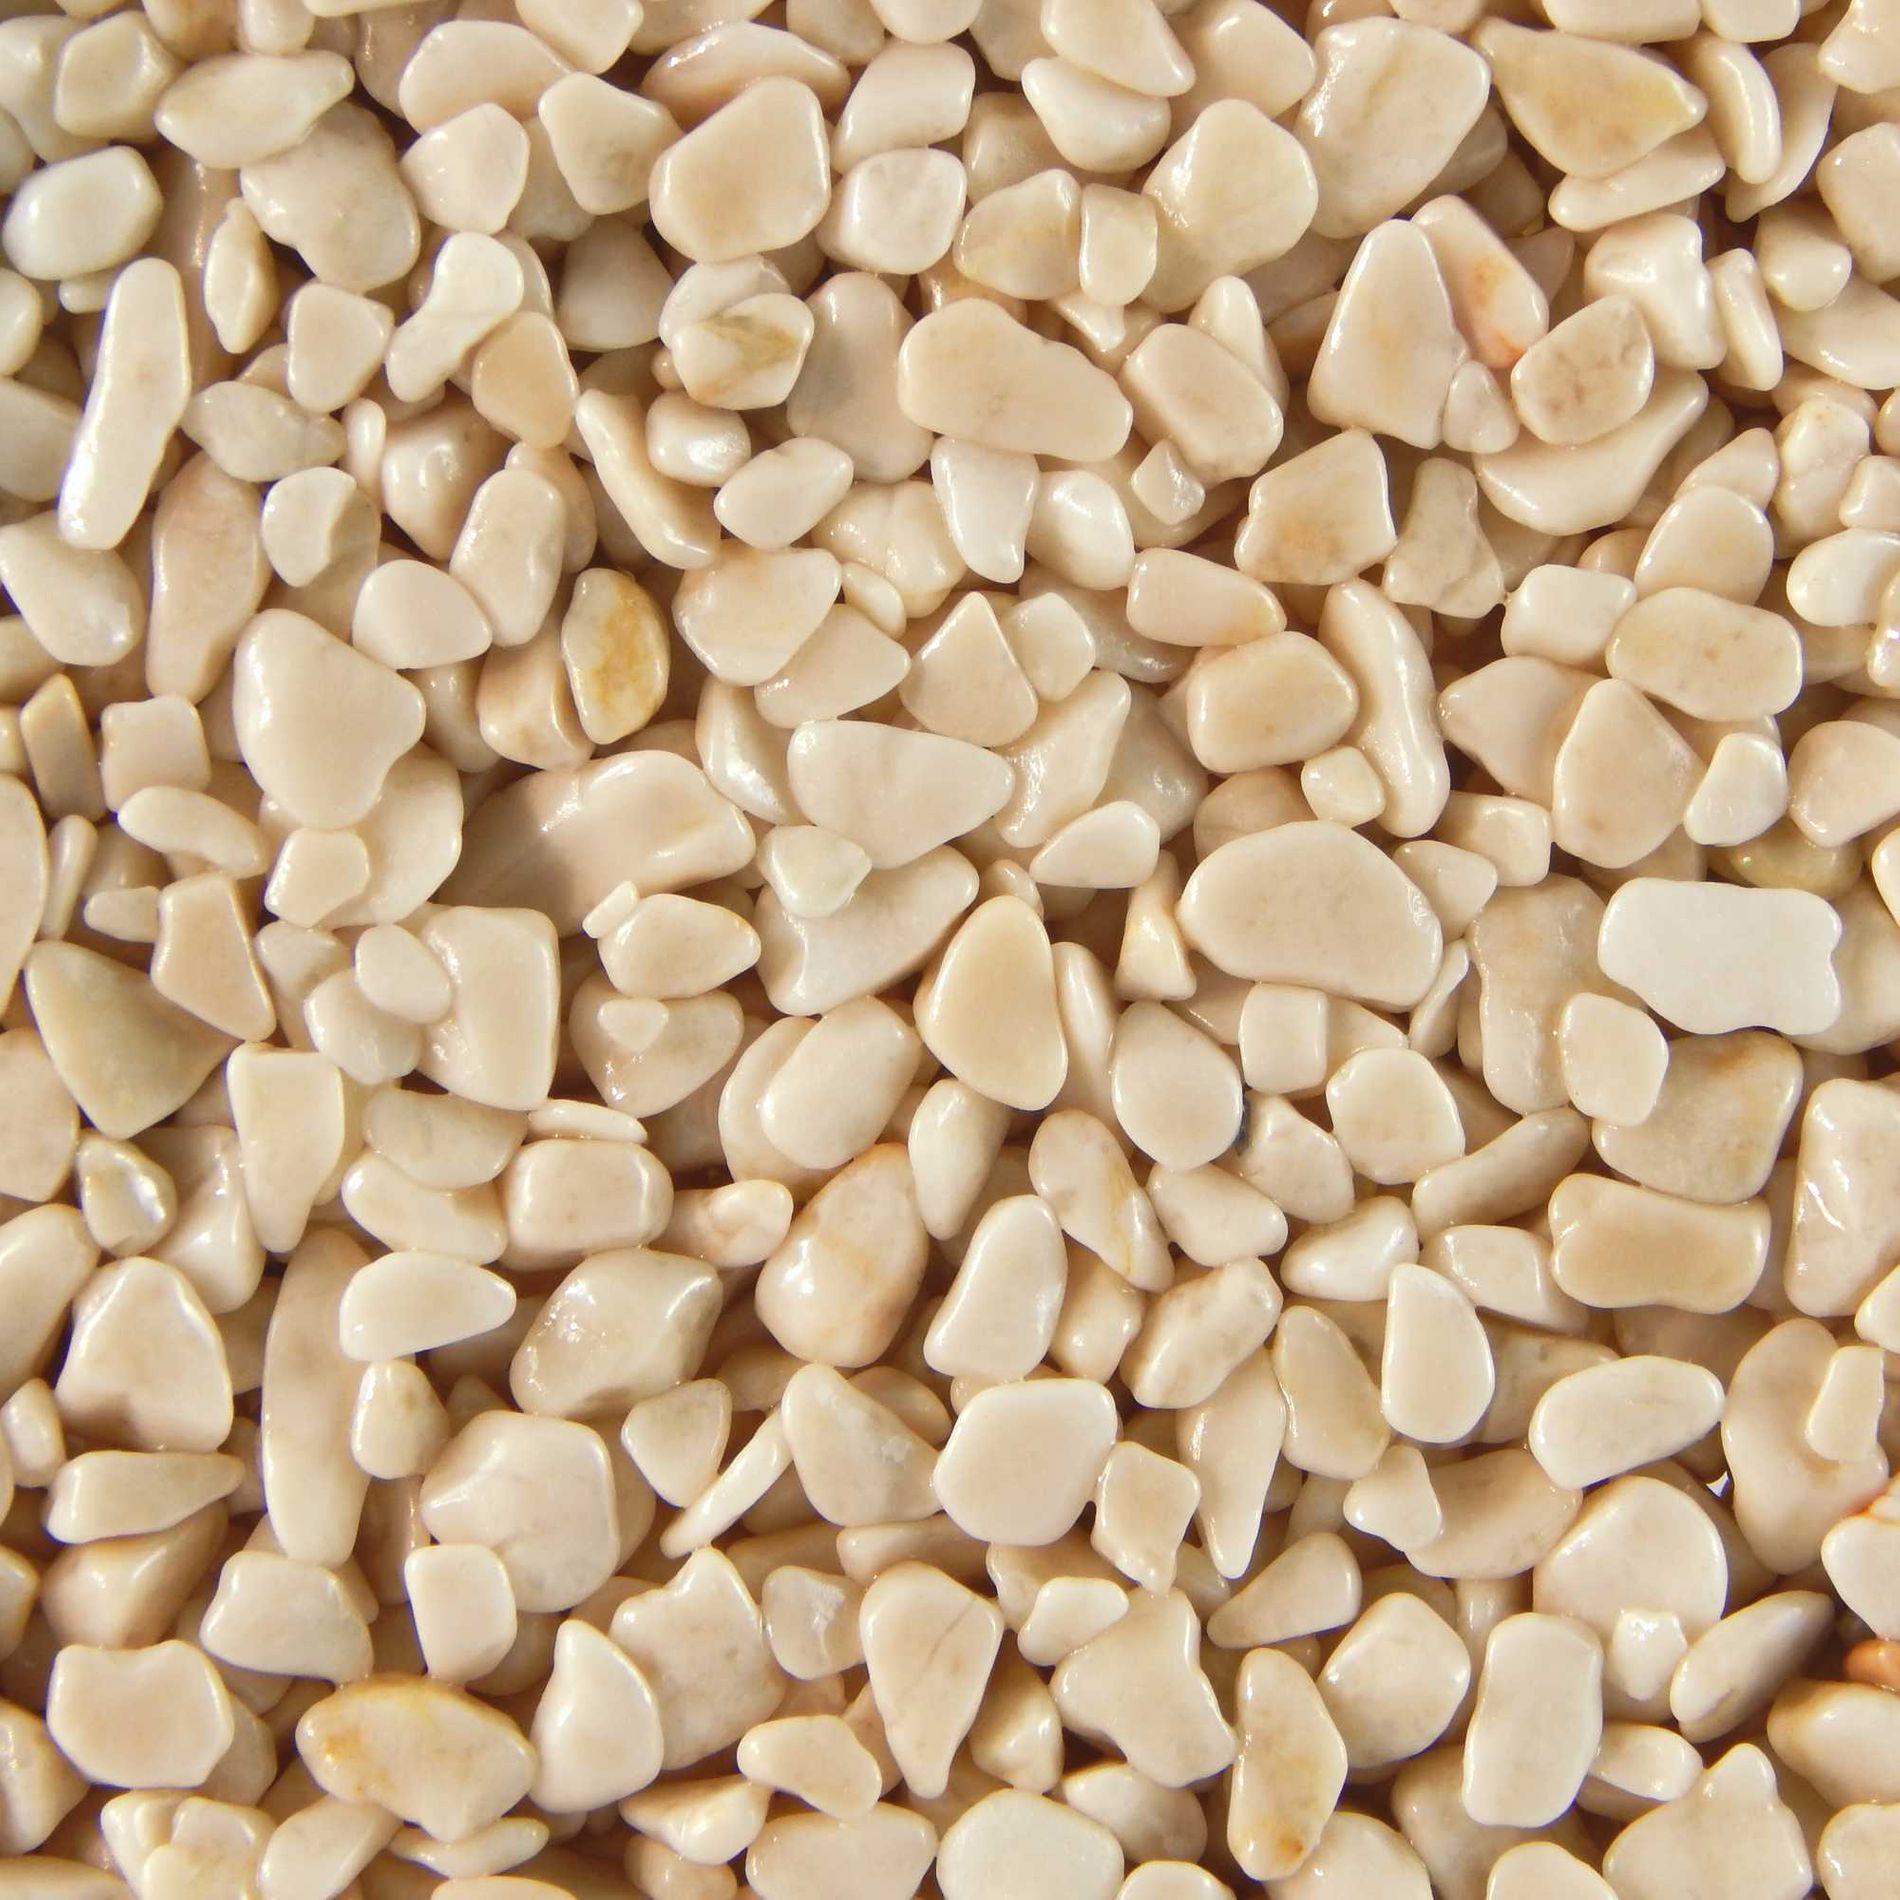 Terralith Marmor - Steinteppich WAND crema (fein) für 1 qm